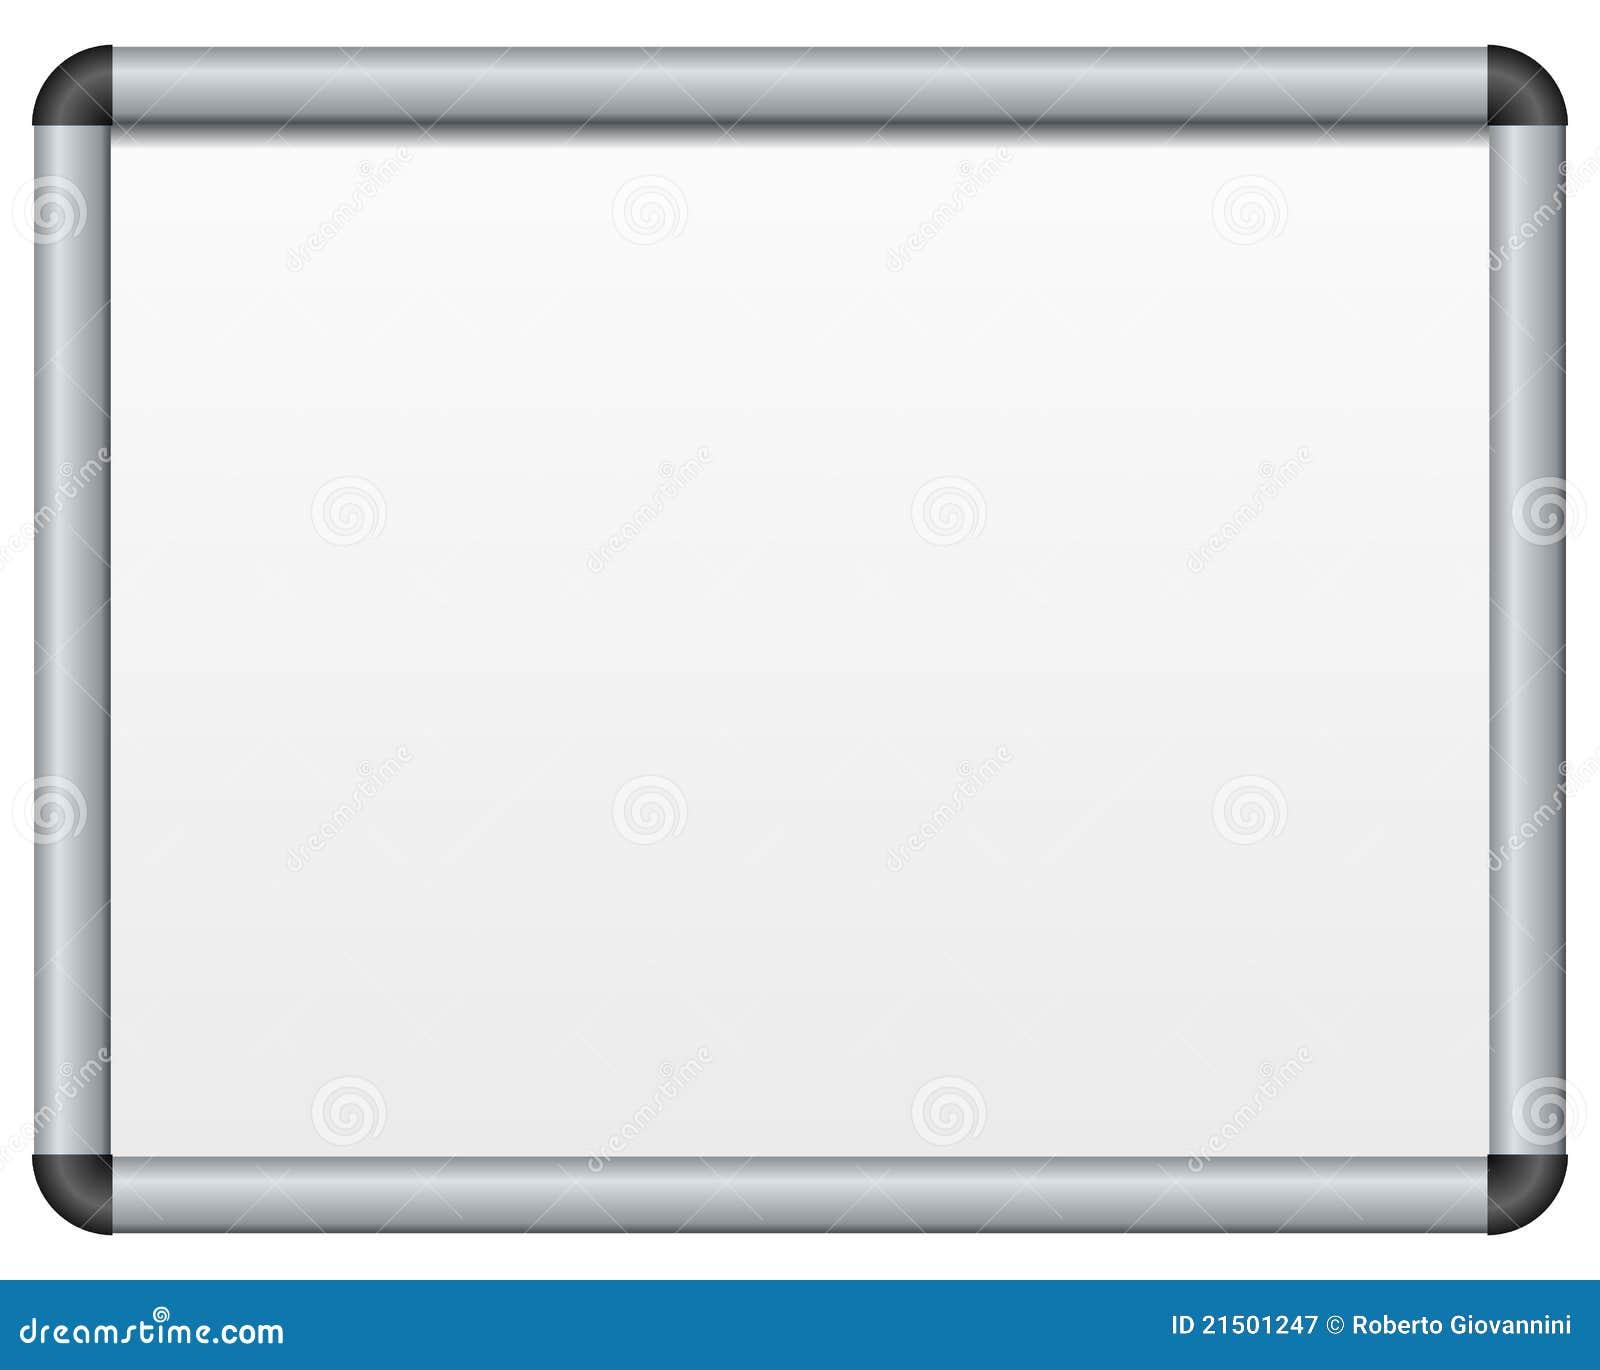 https://thumbs.dreamstime.com/z/blank-magnetic-board-21501247.jpg